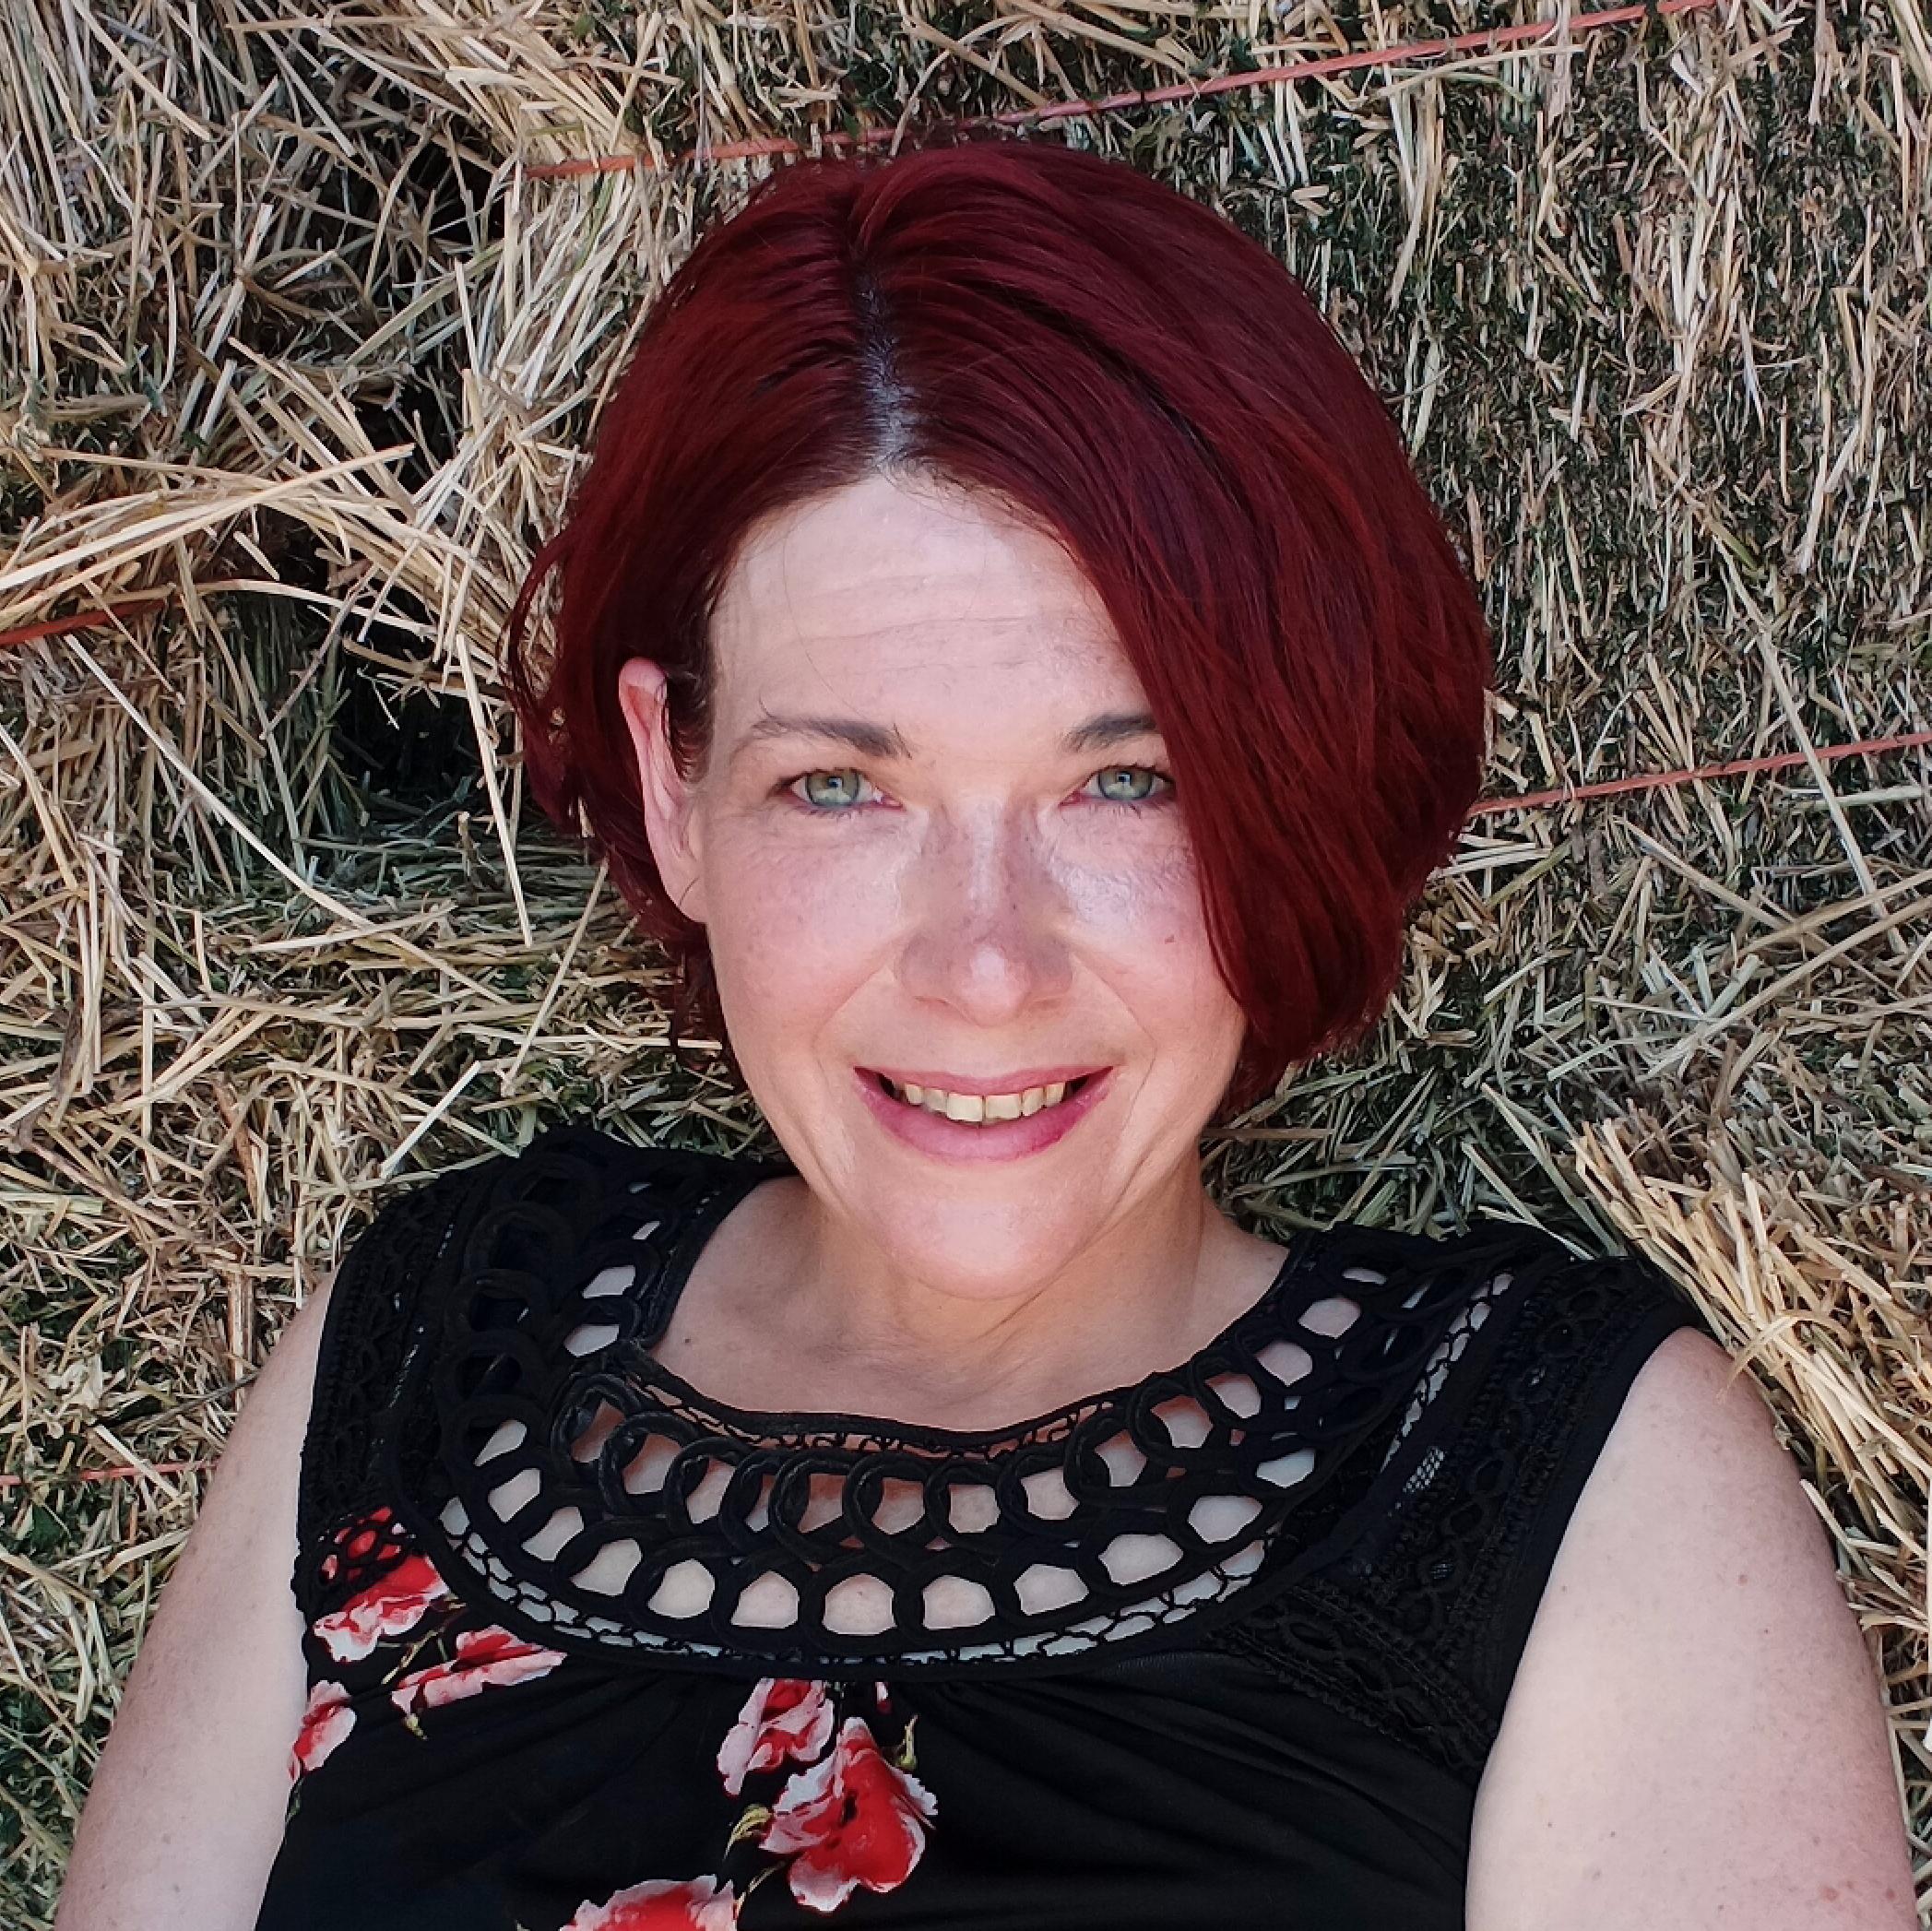 Patty Malowney, Badass Web Designer in Albuquerque, New Mexico